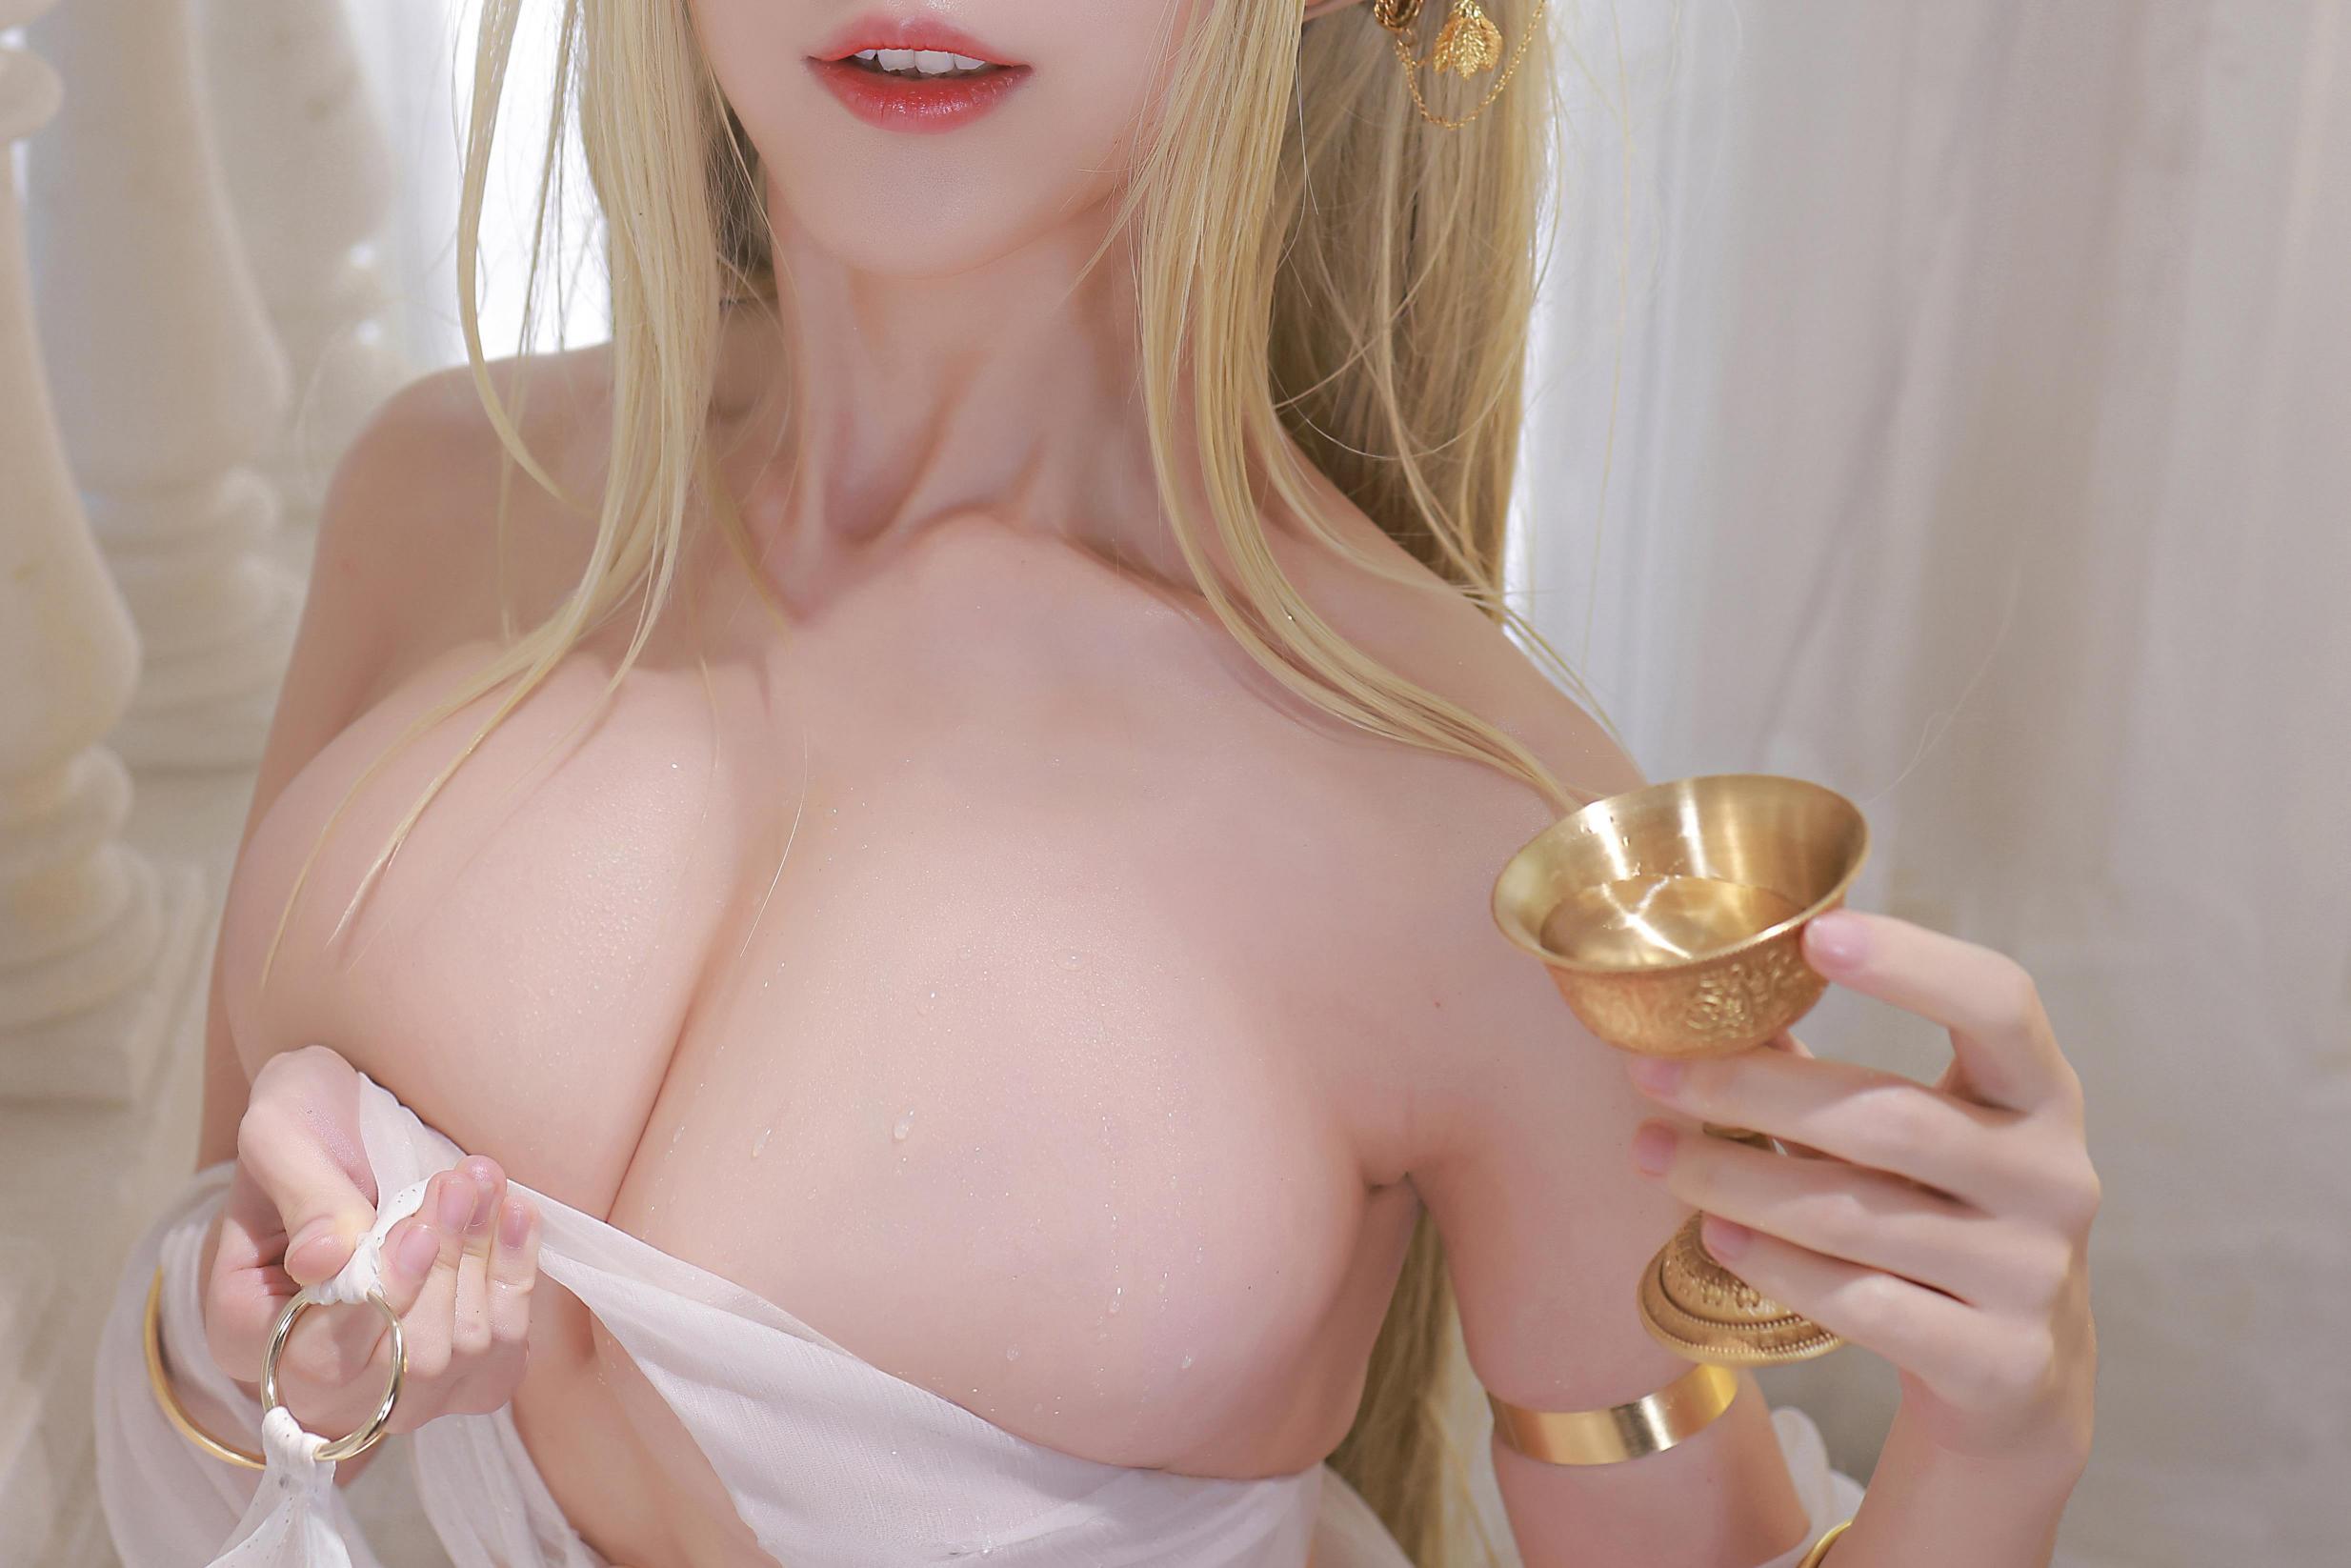 Kuroinu Celestine Cosplay by Aqua 26